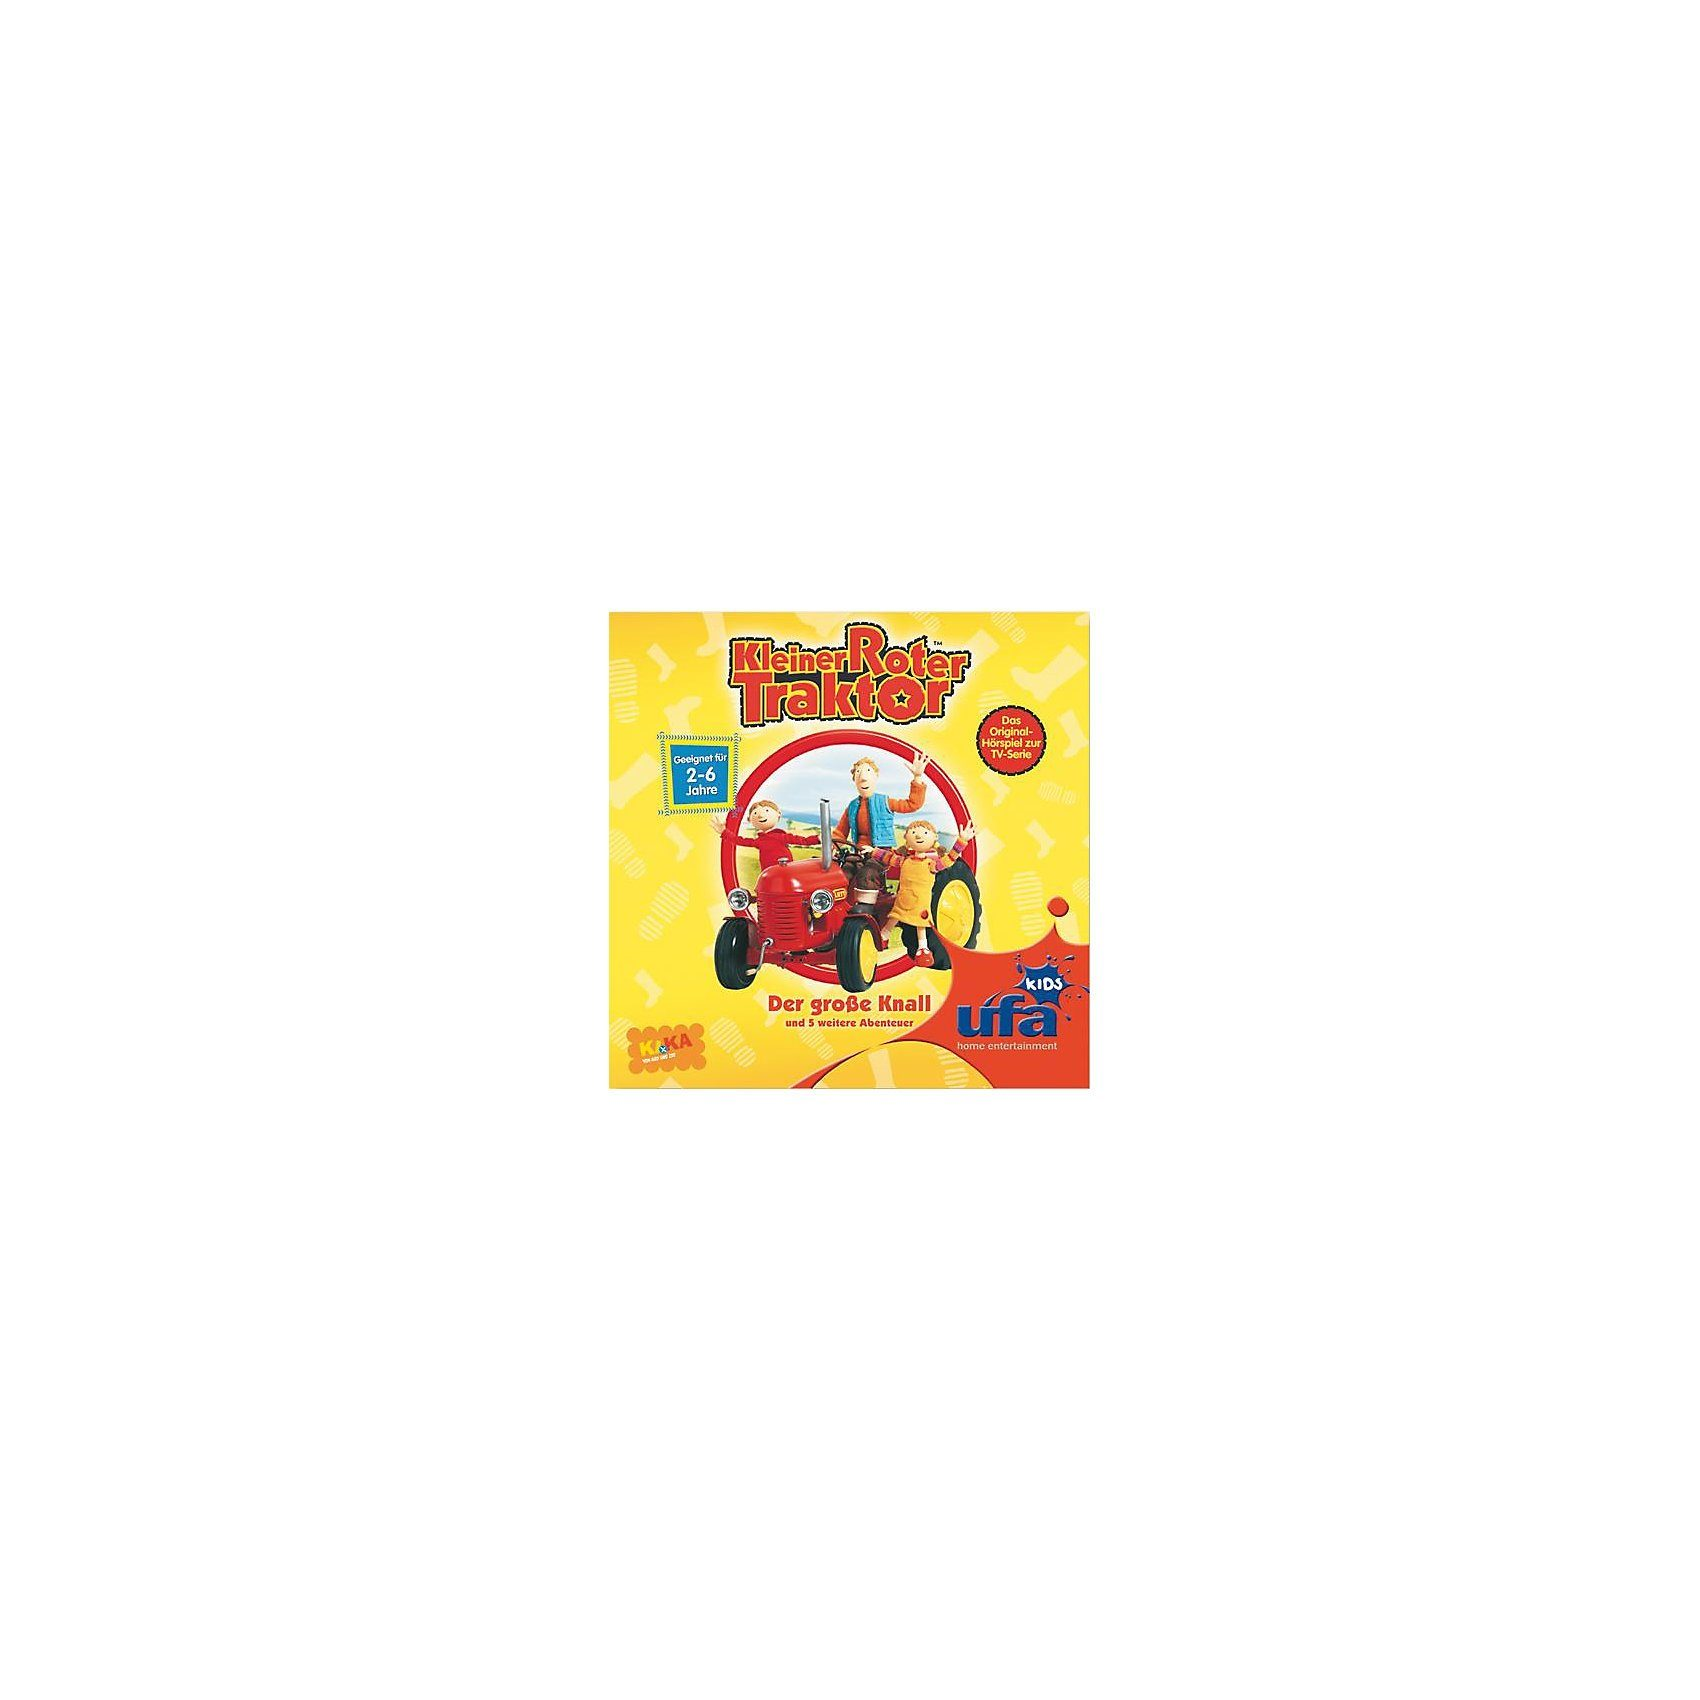 Sony CD Kleiner Roter Traktor 01